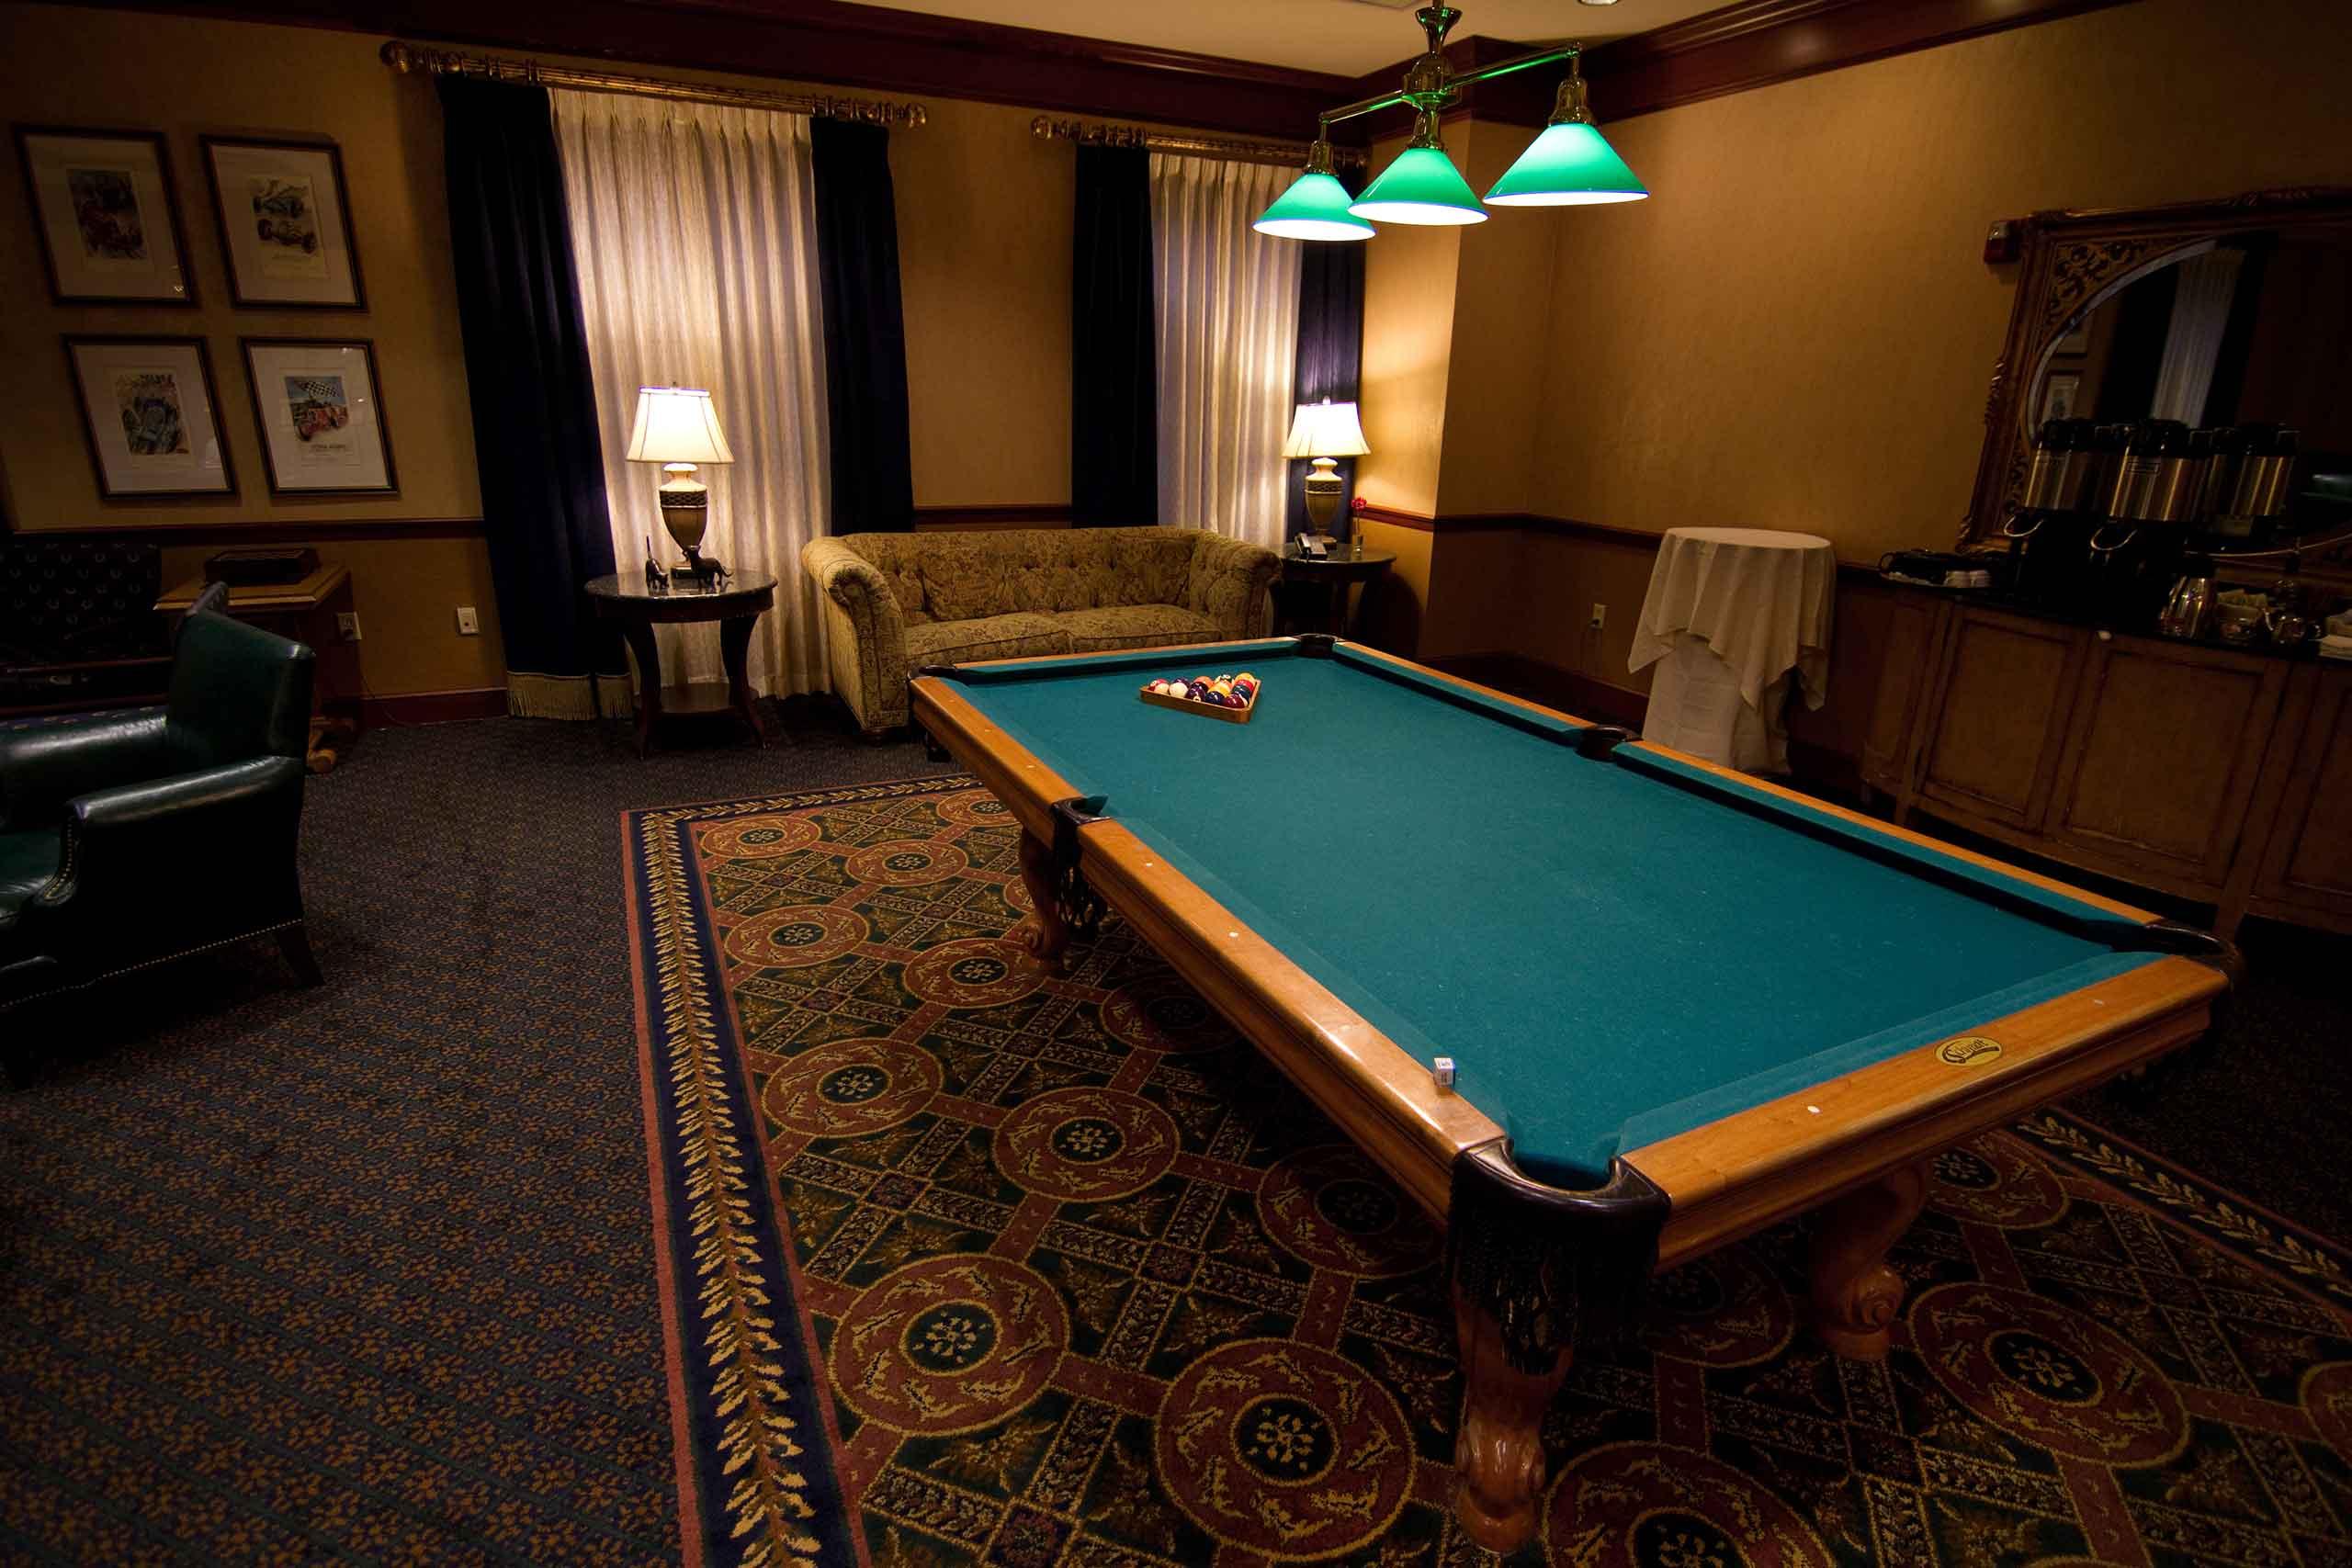 The-Hallmark-of-Creve-Coeur-Pool-Table